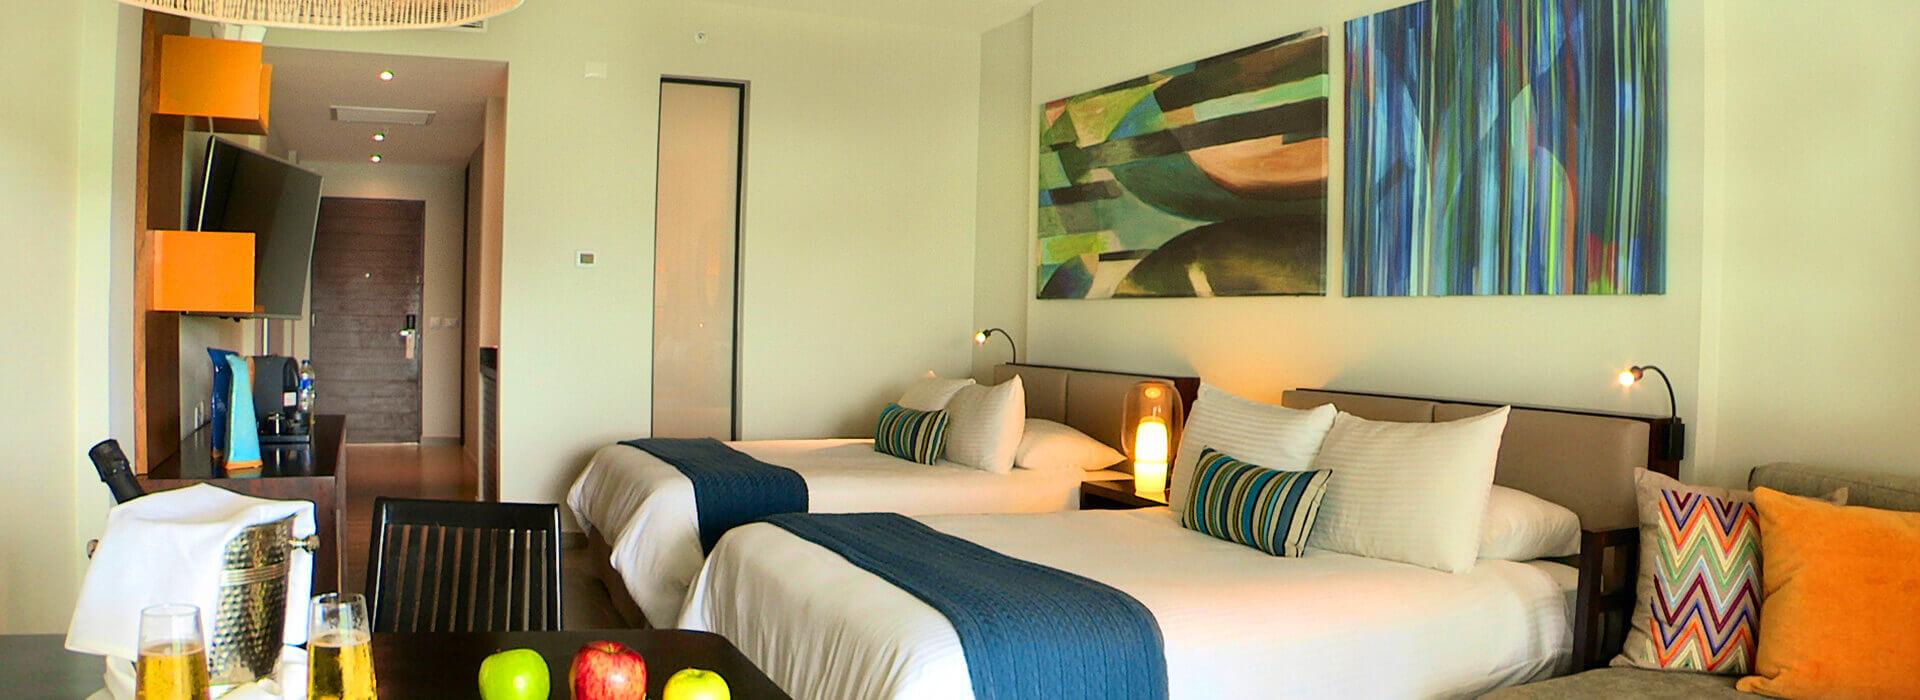 suite in resort punta cana